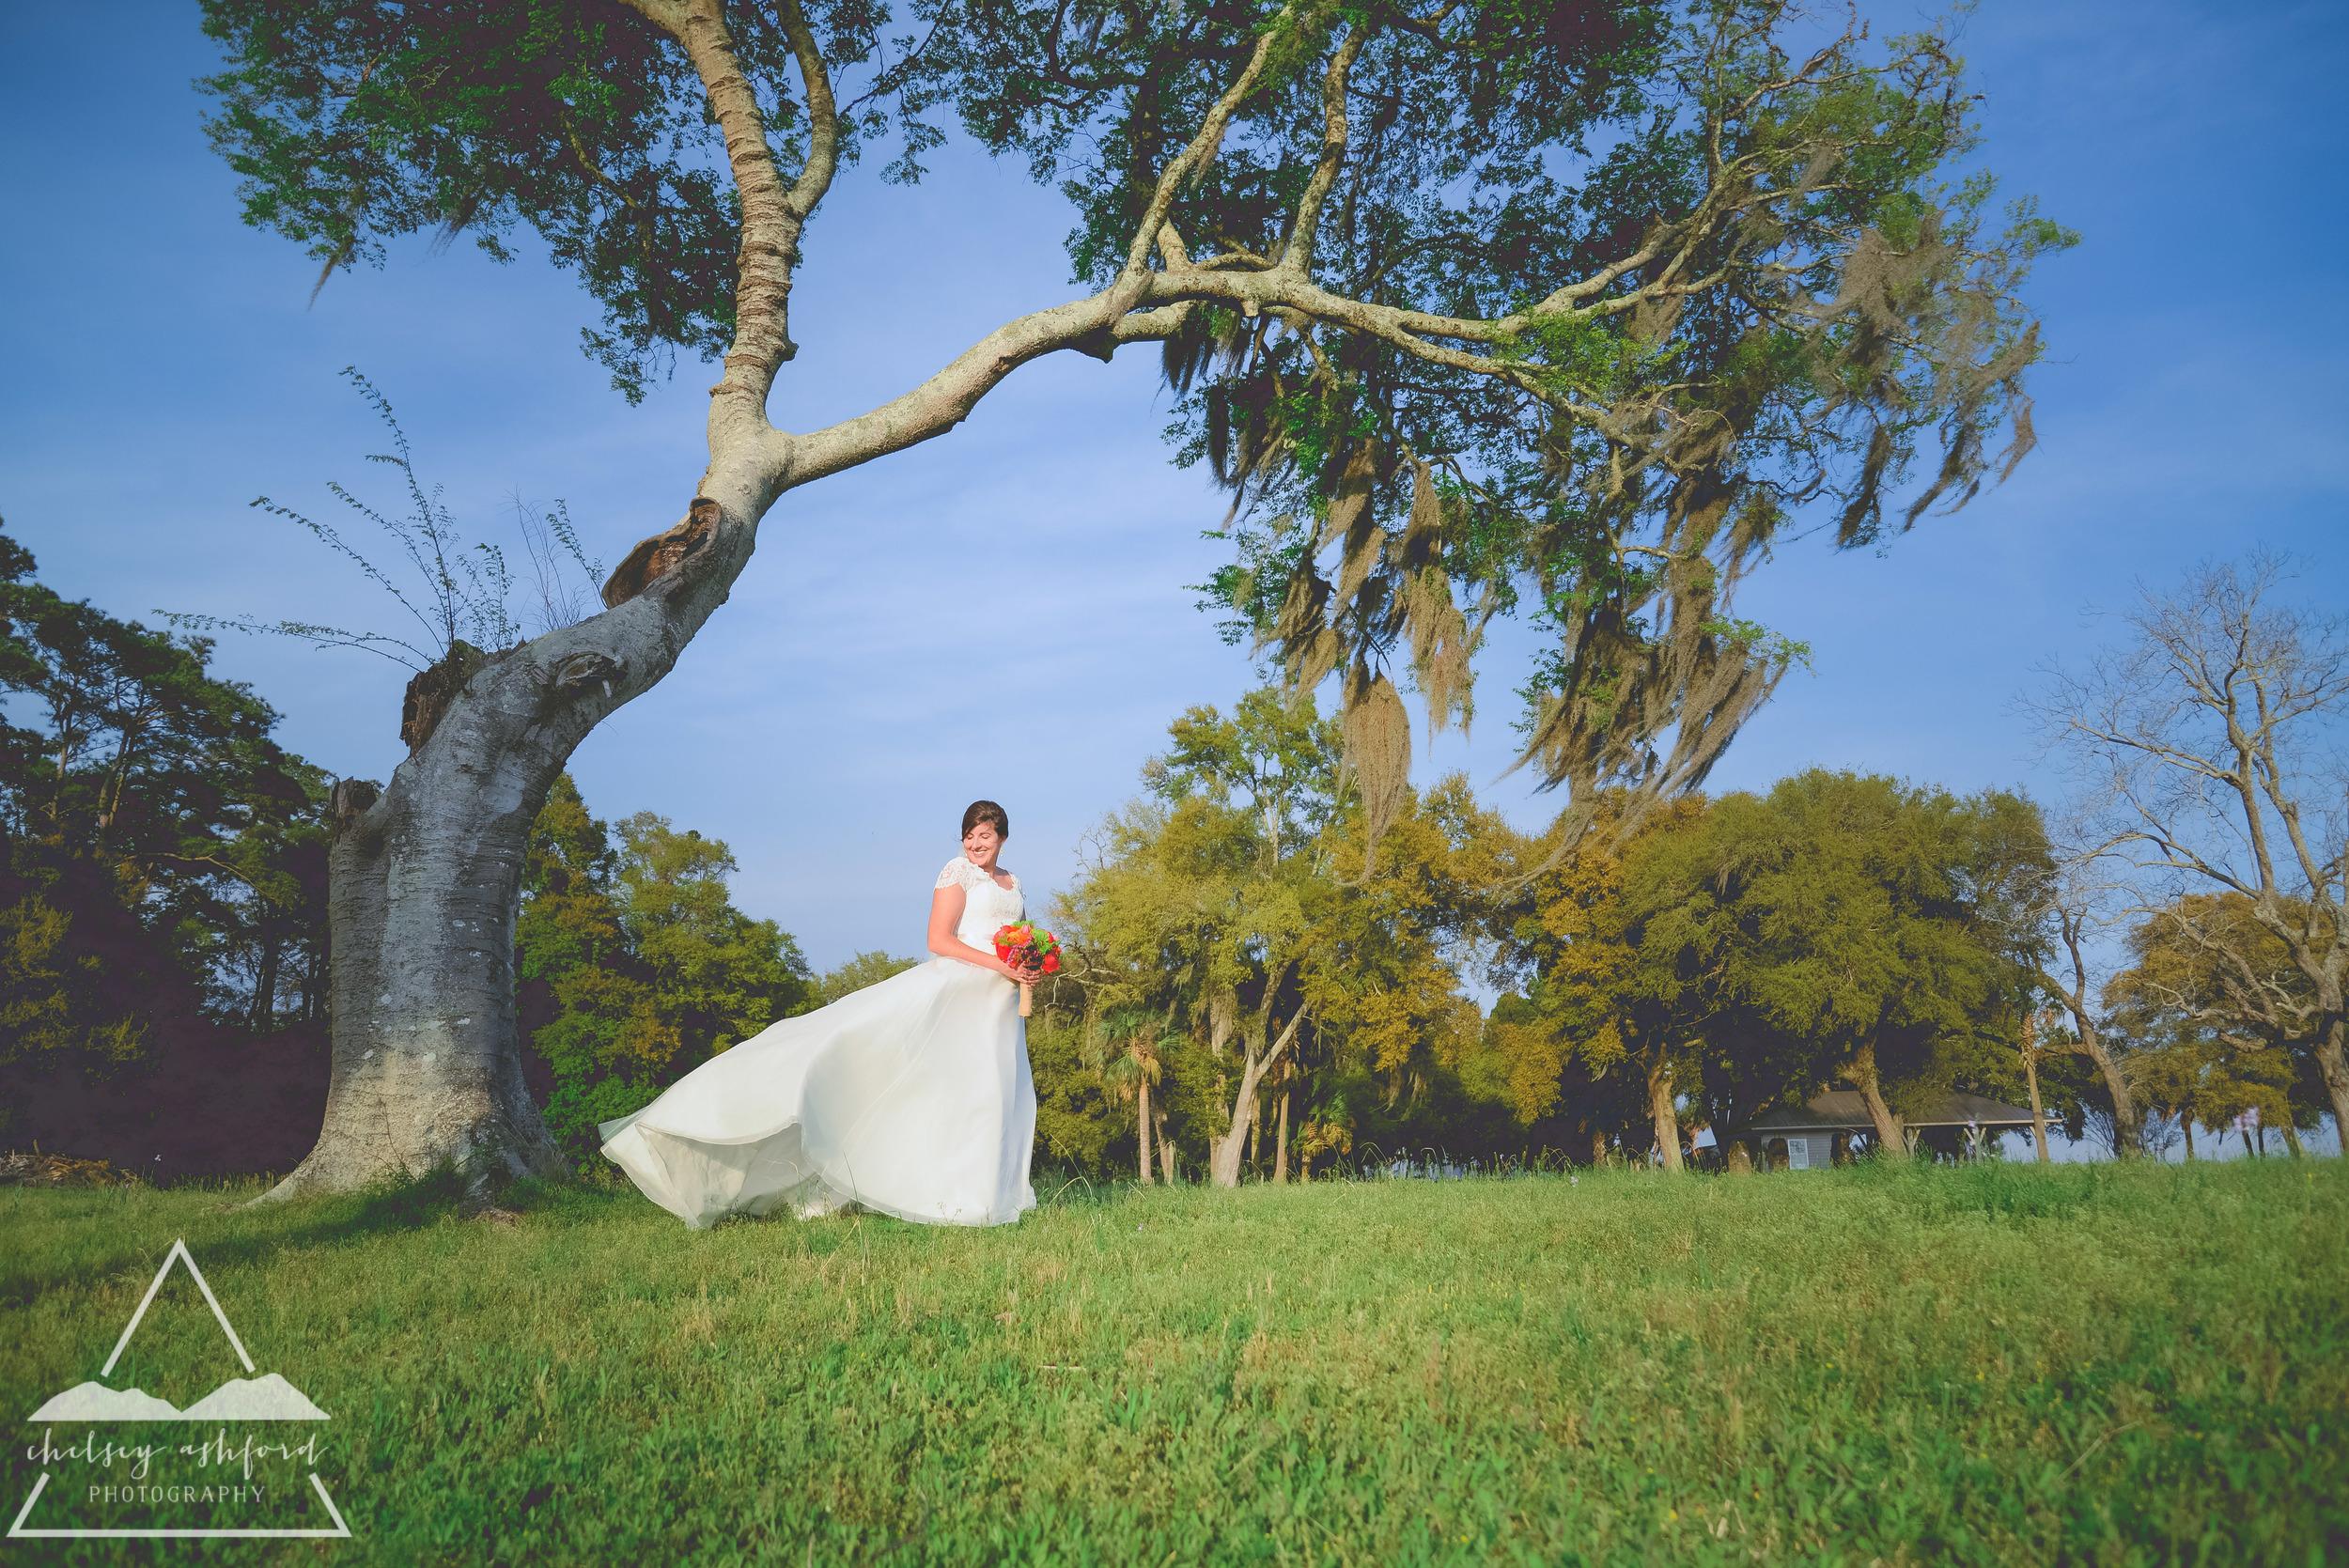 Sylvia_bridals_web-36.jpg